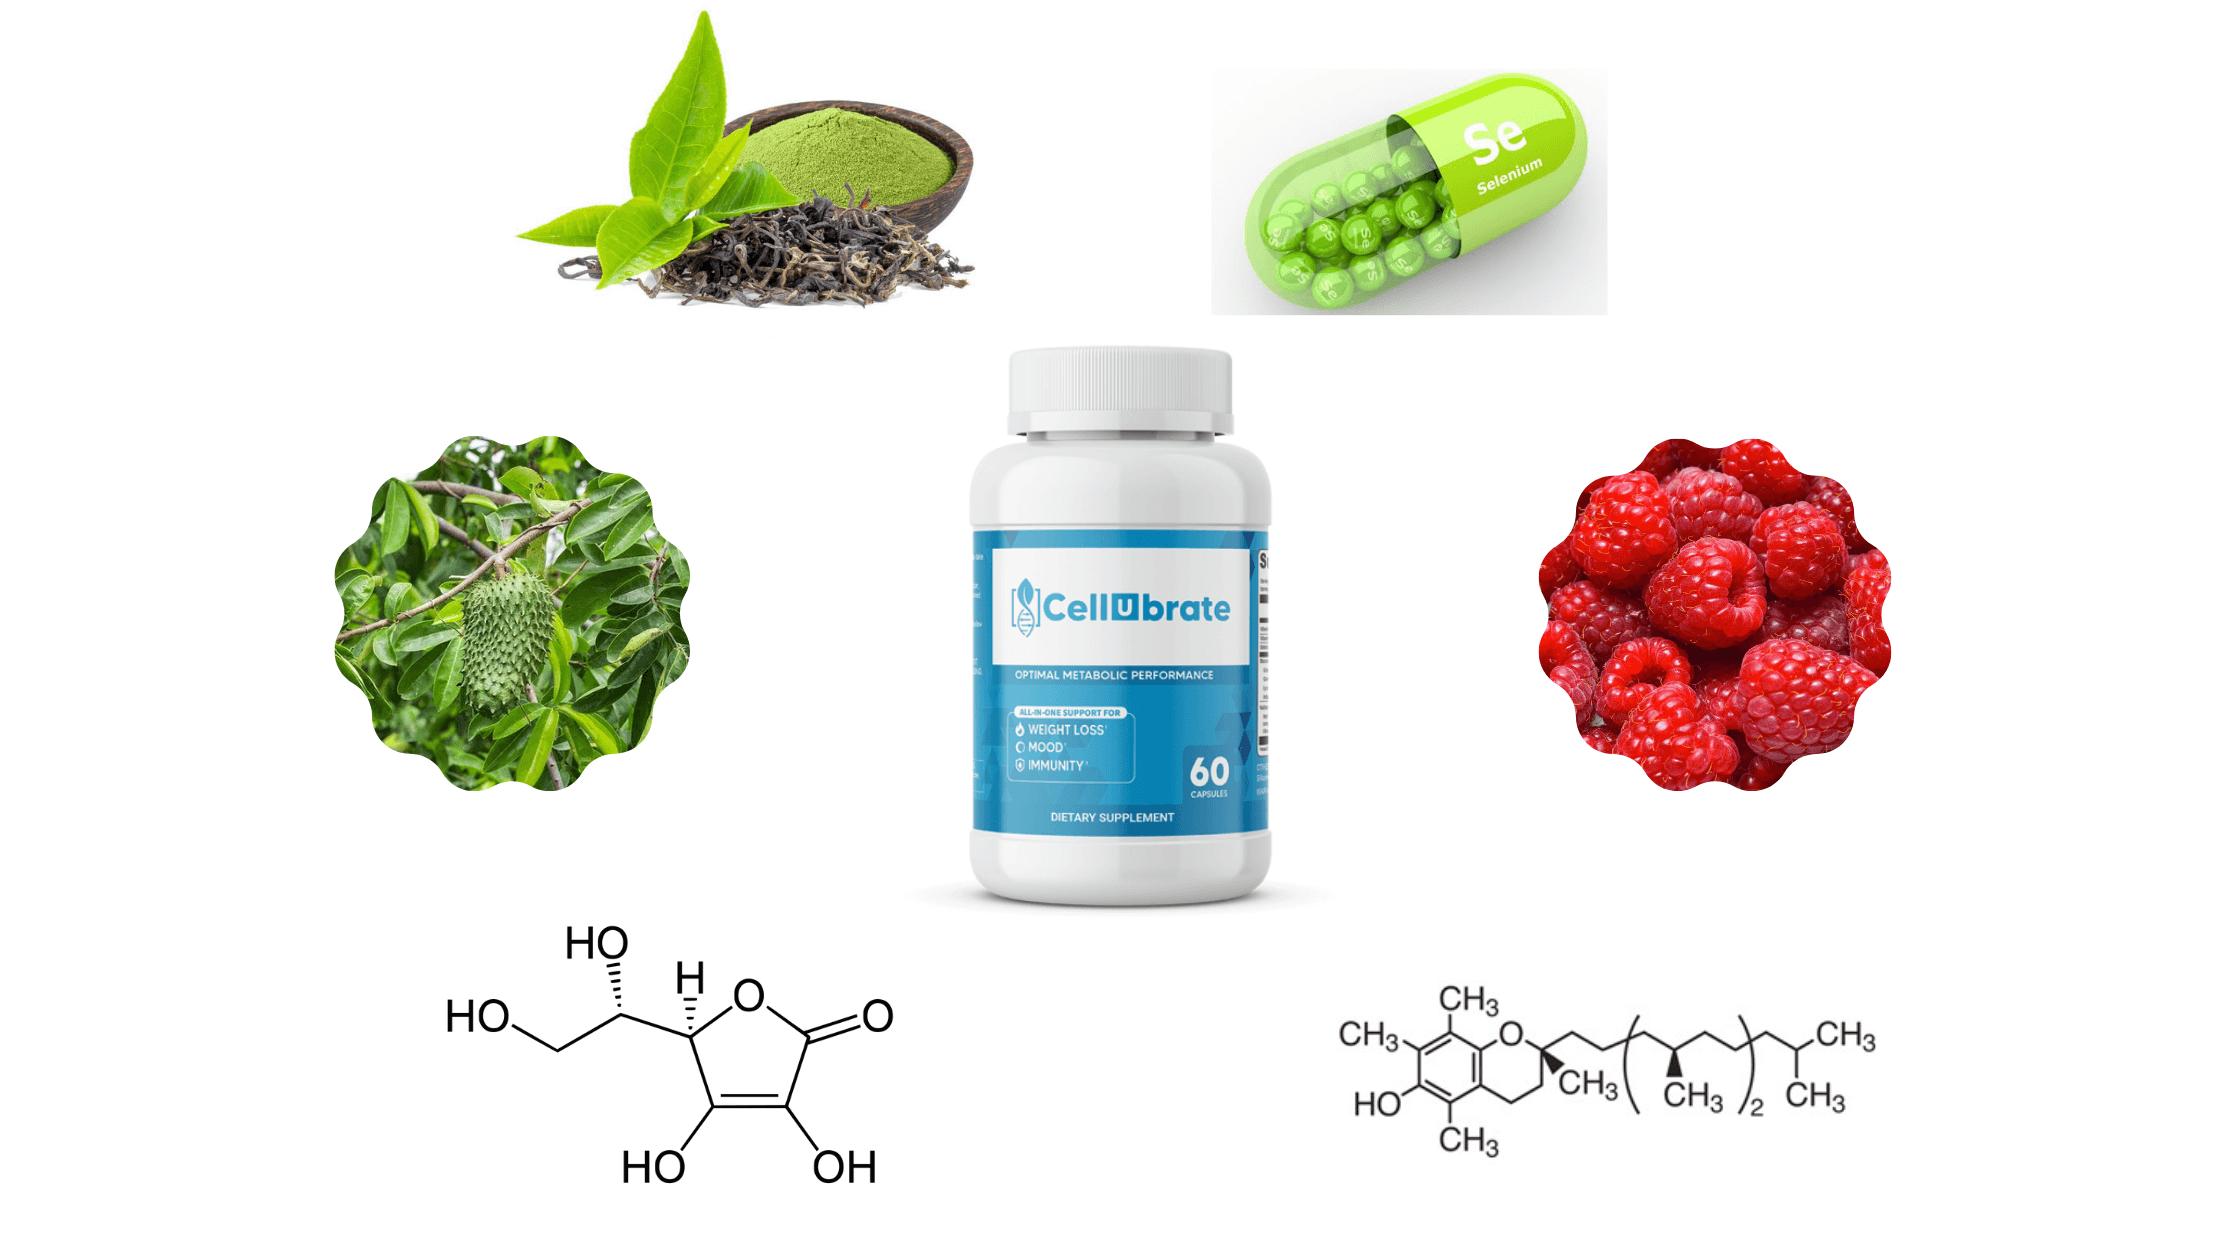 Cellubrate Ingredients